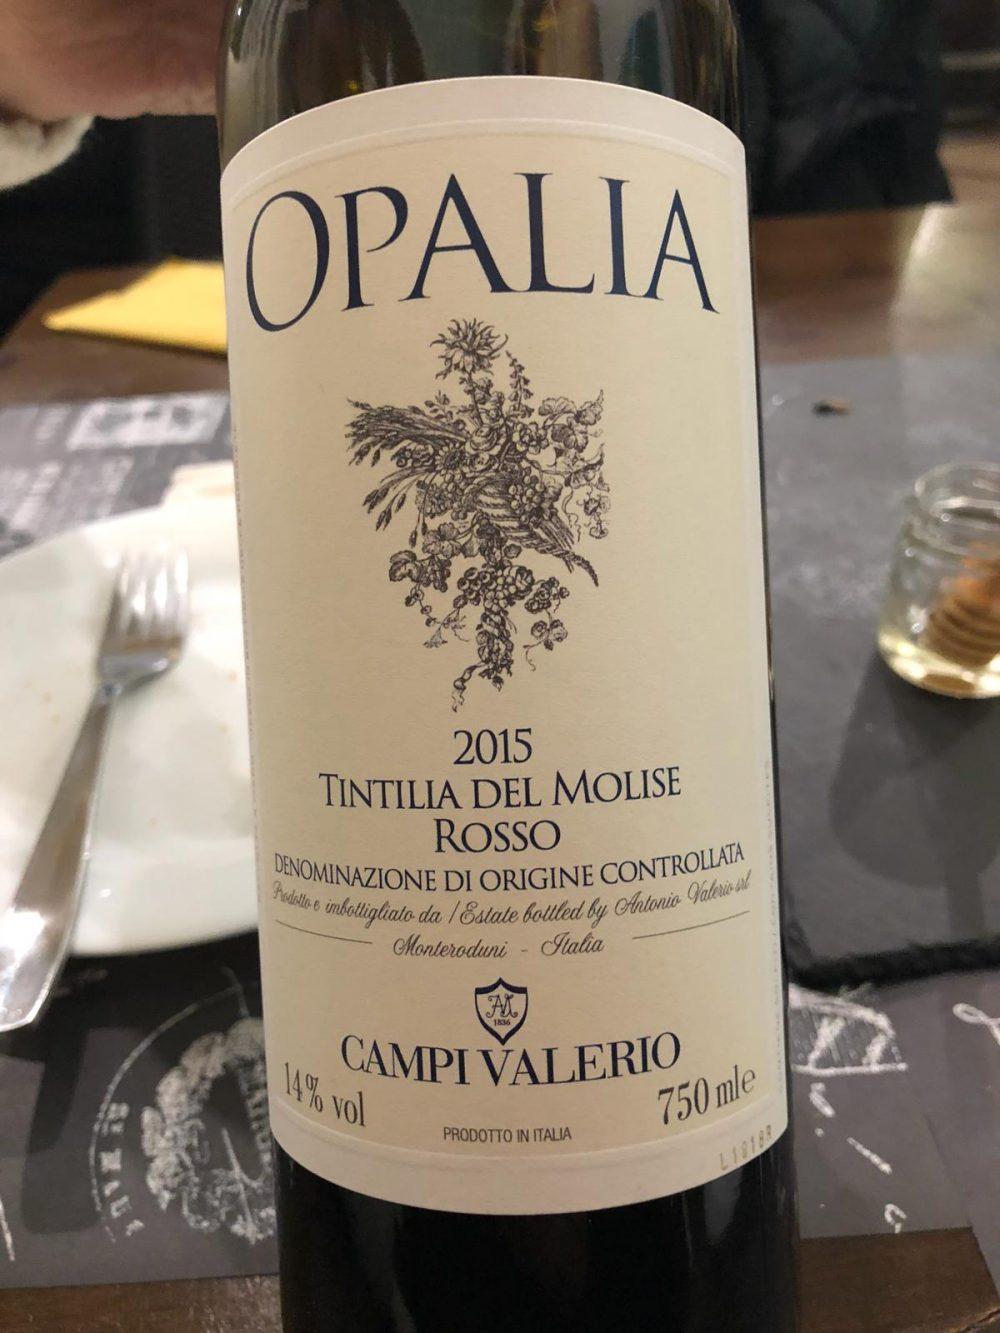 Opalia Tintilla del Molise 2015